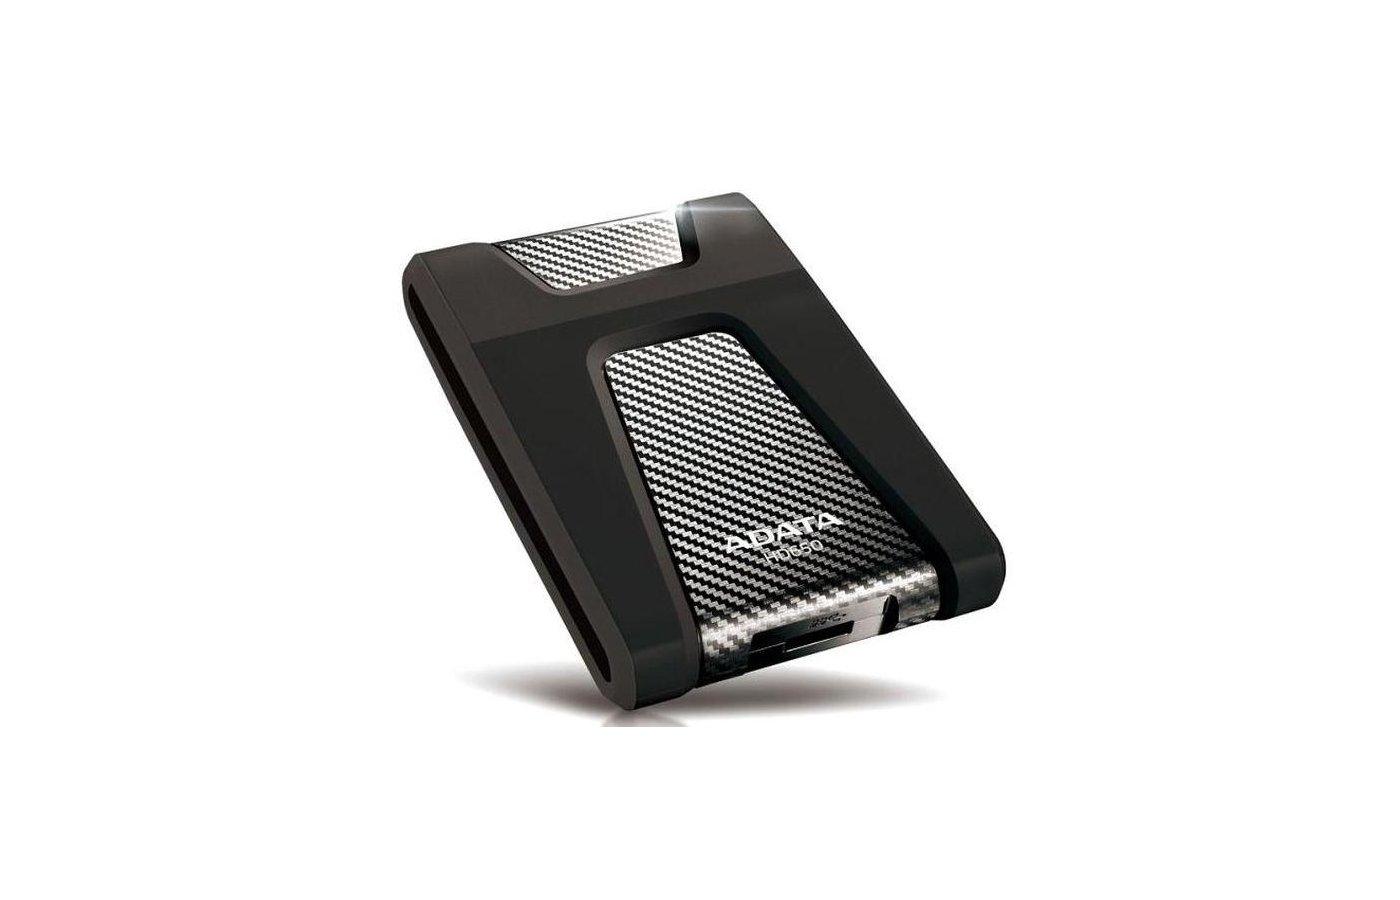 Внешний жесткий диск A-Data USB 3.0 2TB DashDrive HD650 Black